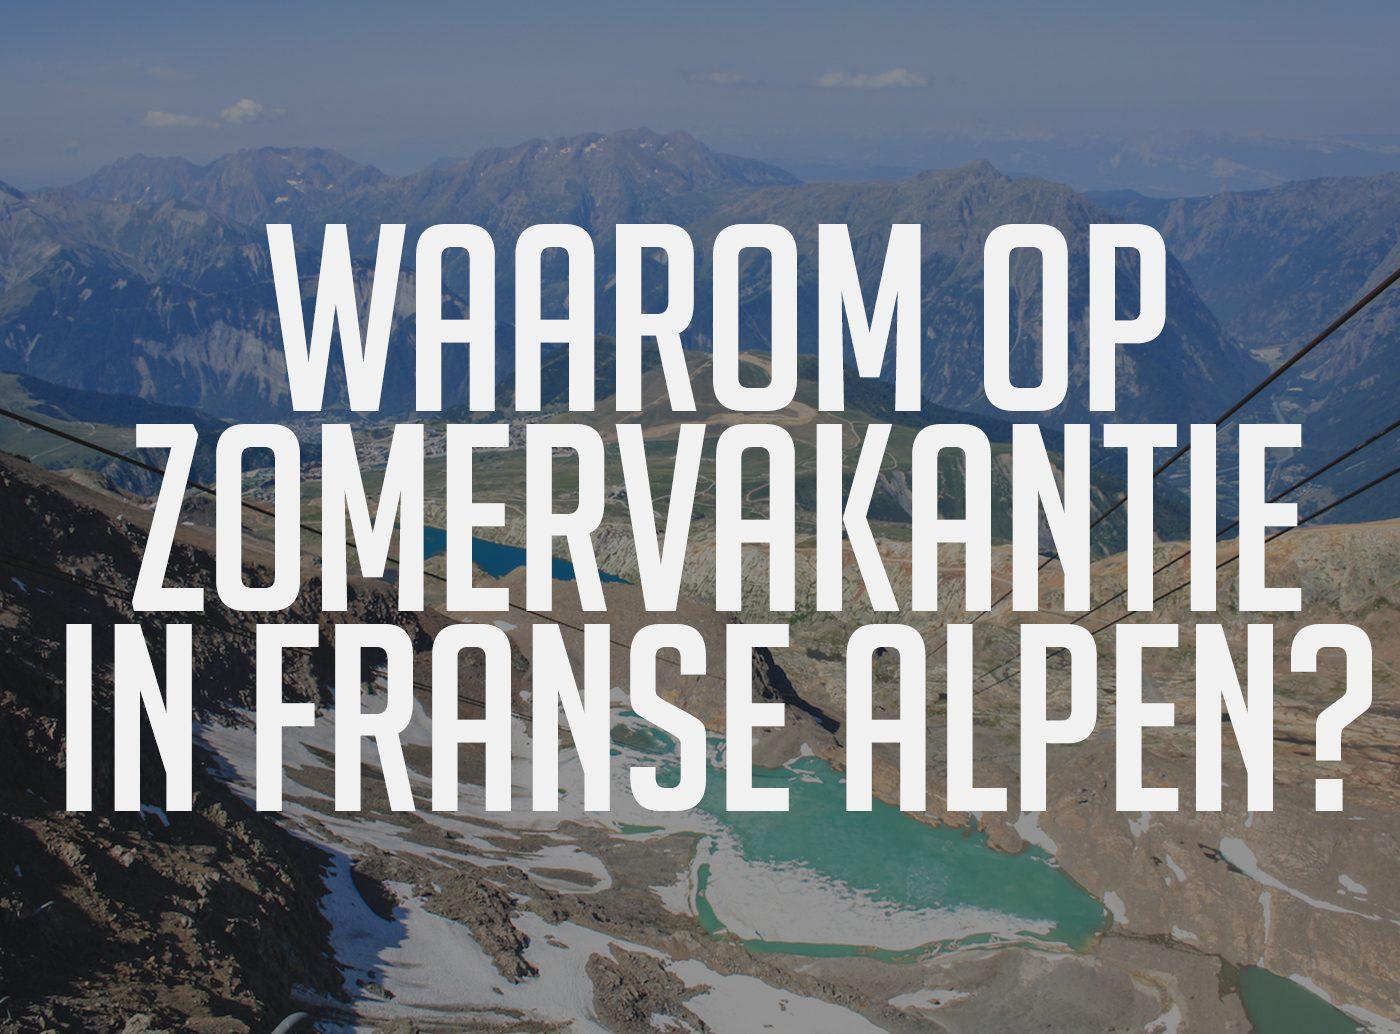 Franse Alpen zomervakantie